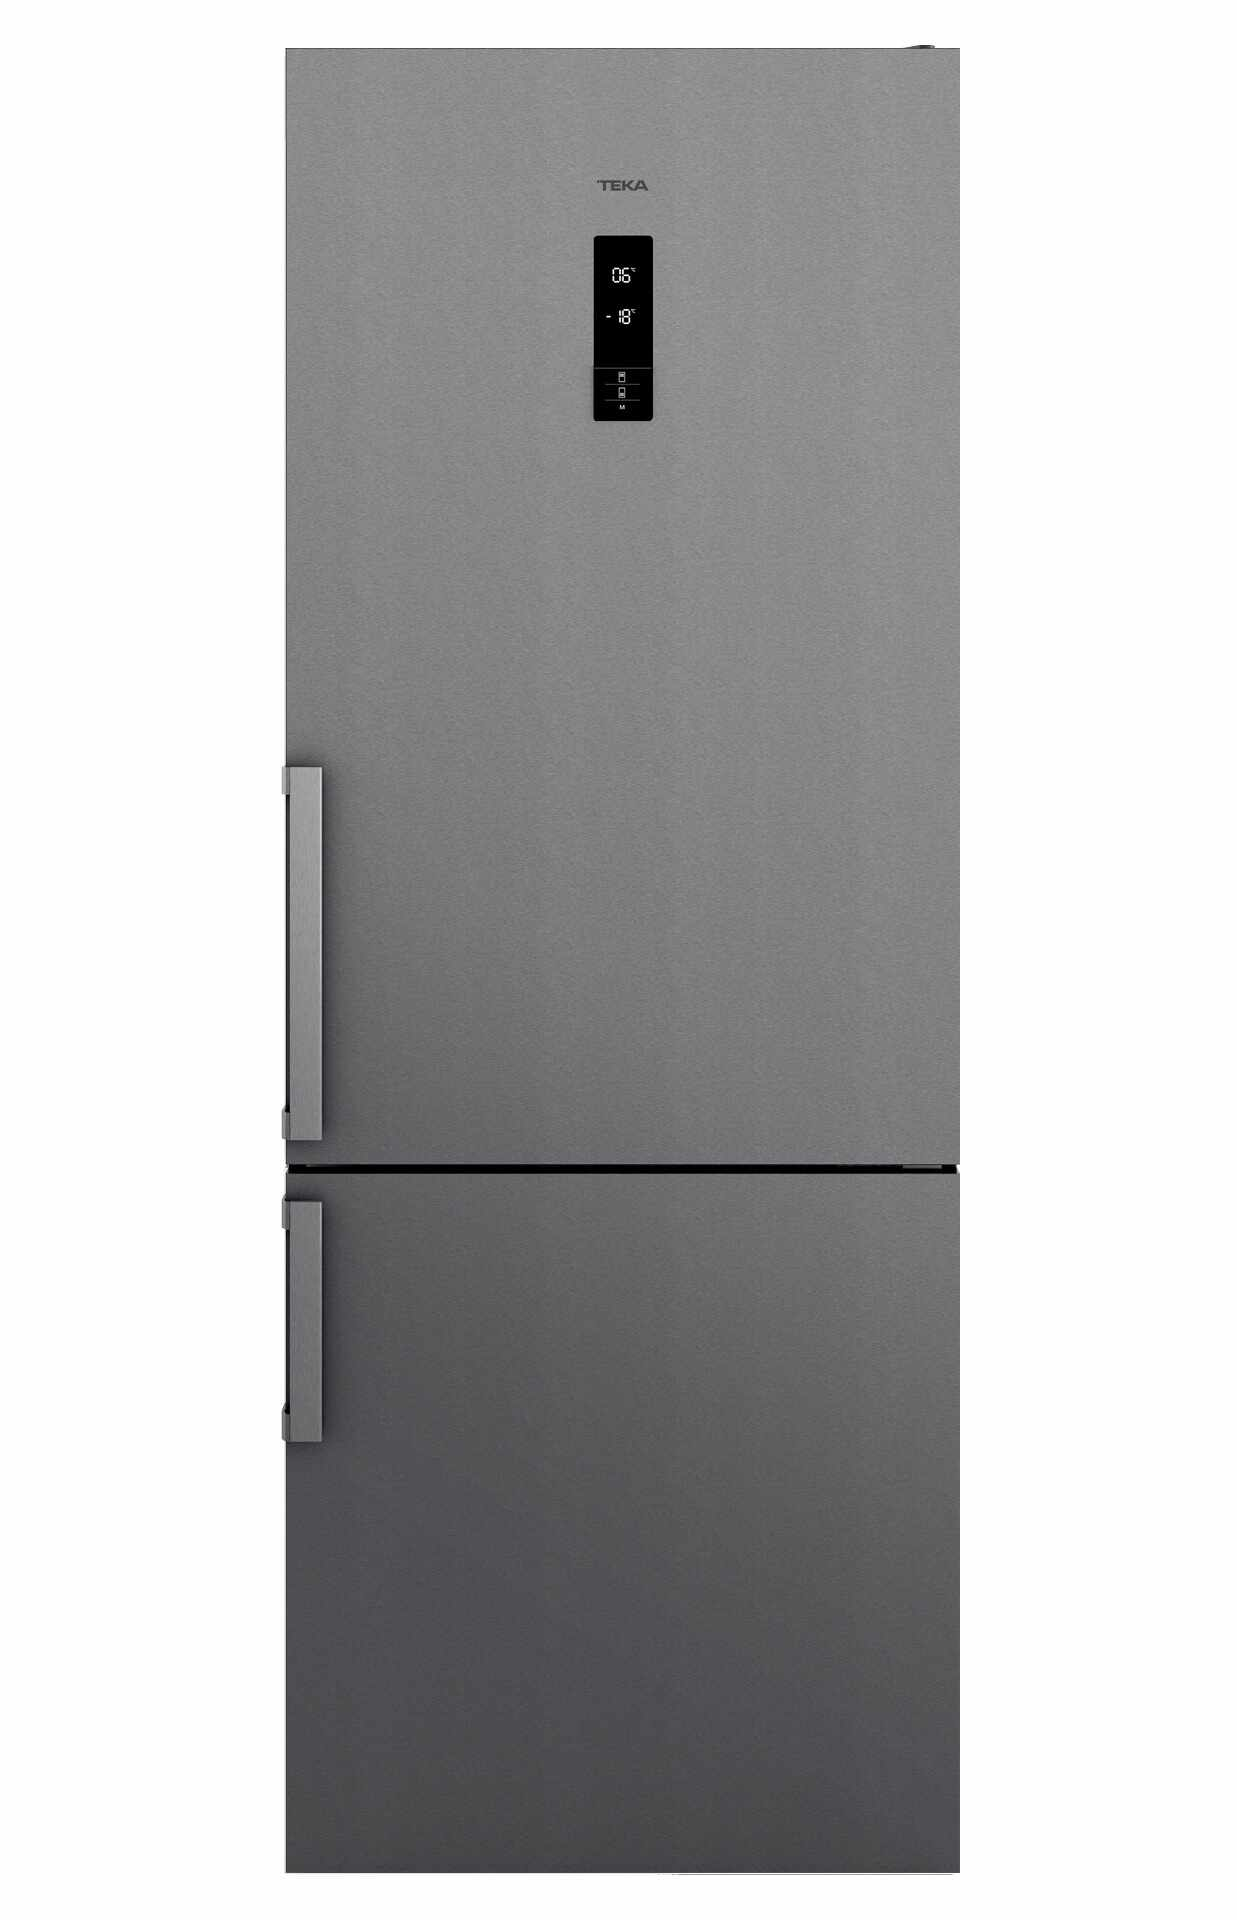 Combina frigorifica Teka Maestro RBF 78720 SS LongLife No Frost IonClean 461 litri net clasa A++ inox la pret 4806.65 lei